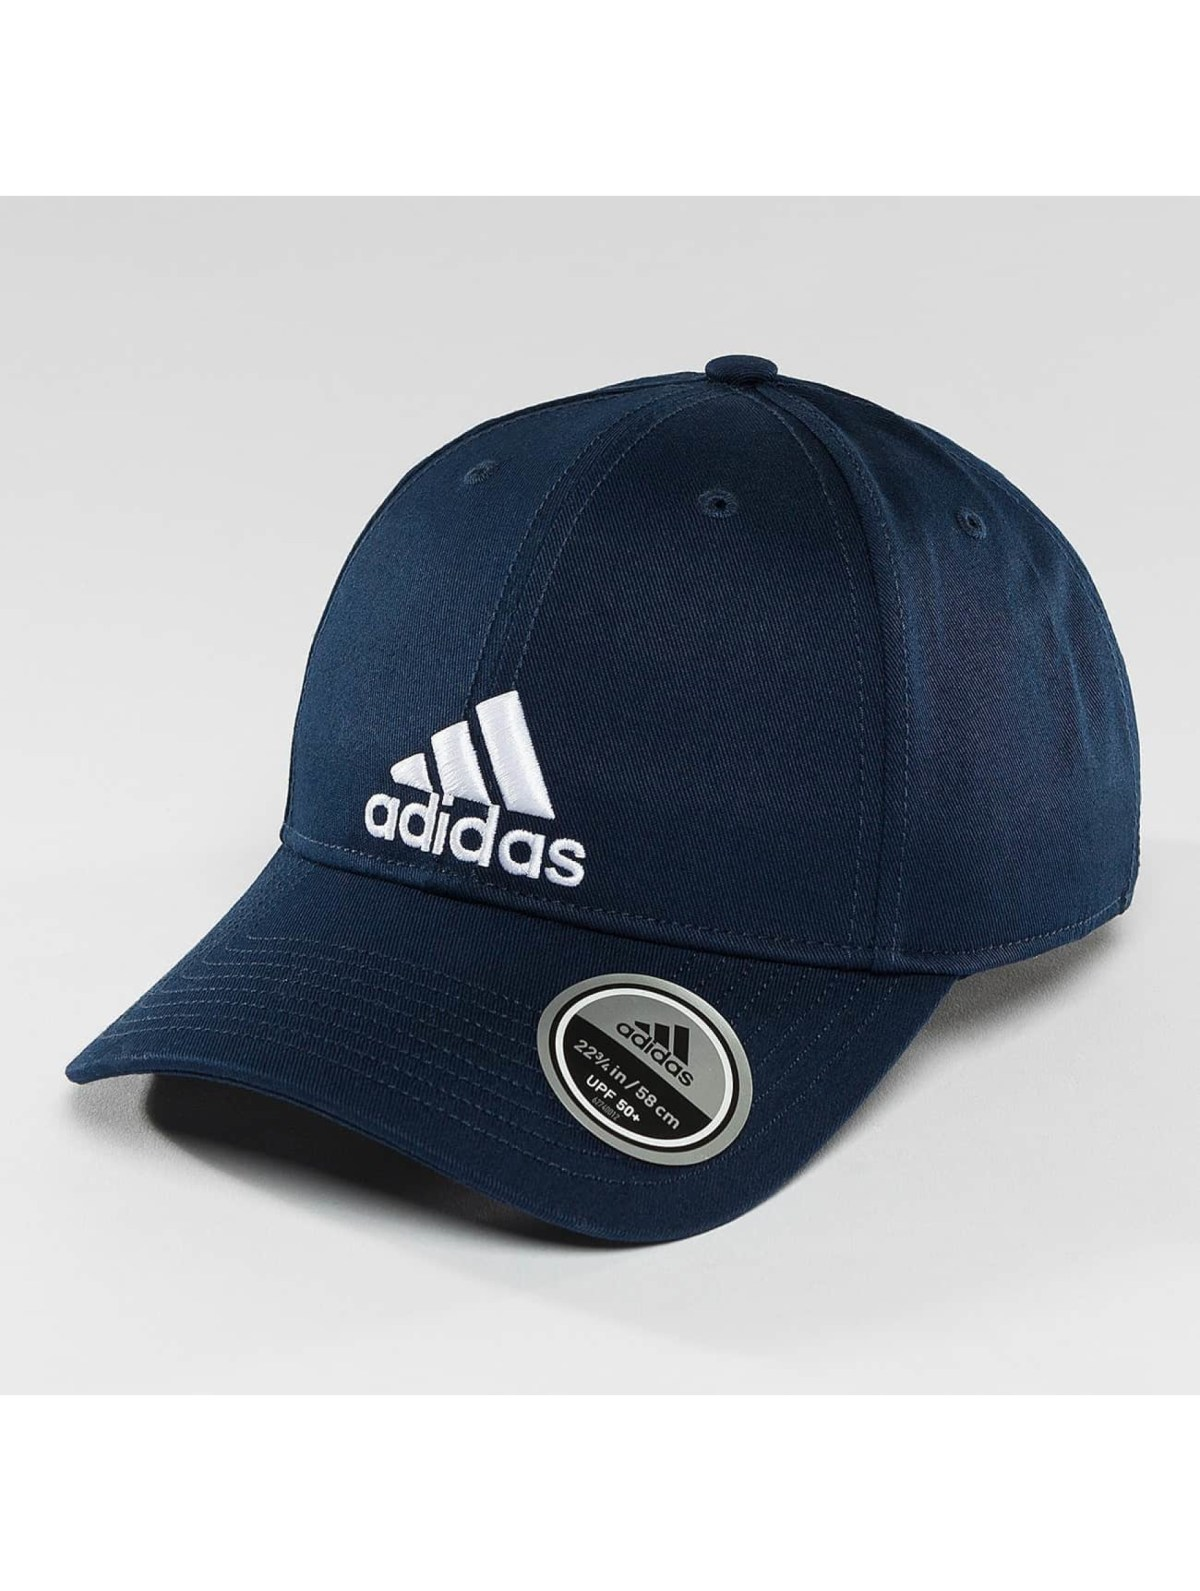 adidas Performance Männer,Frauen Snapback Cap Snapback Cap in blau